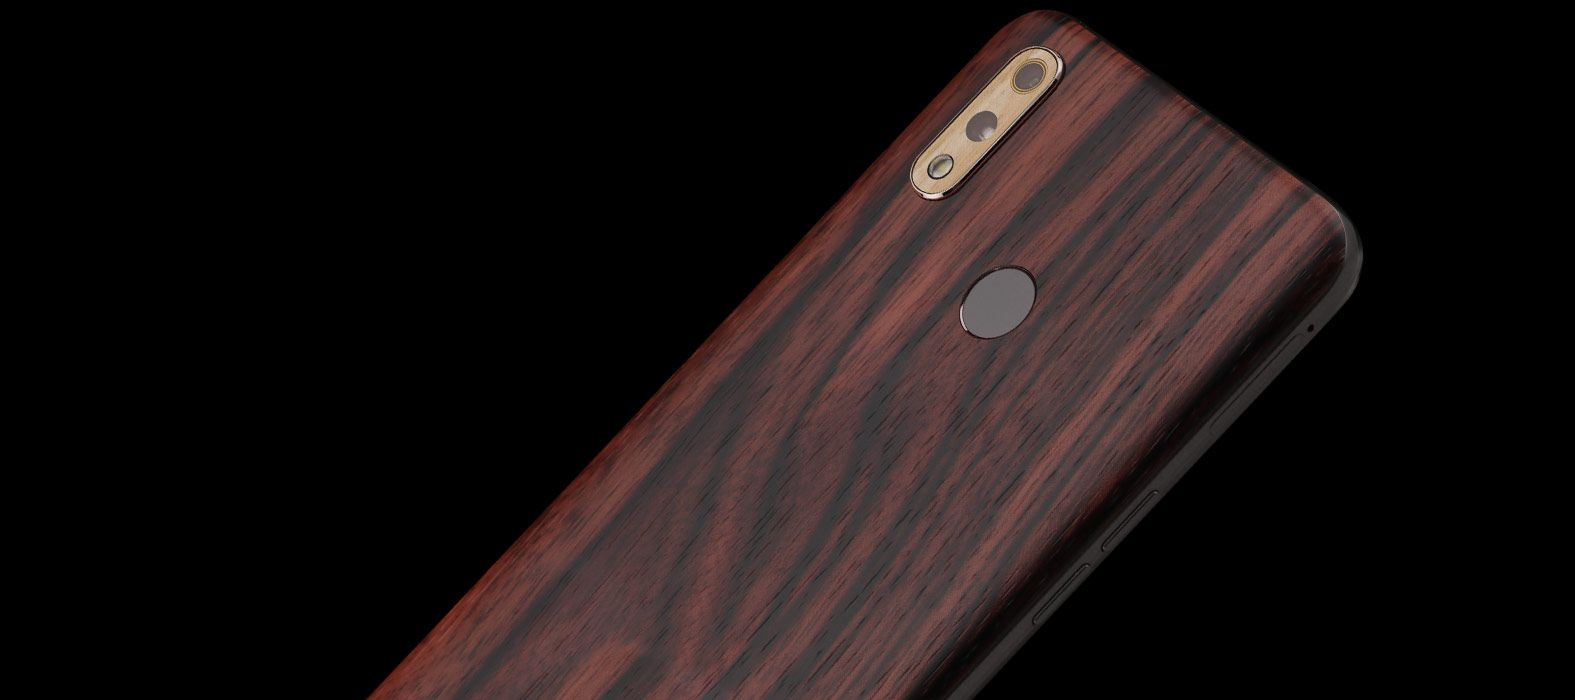 Realme-3-Pro_Ebony-Wood_Skins